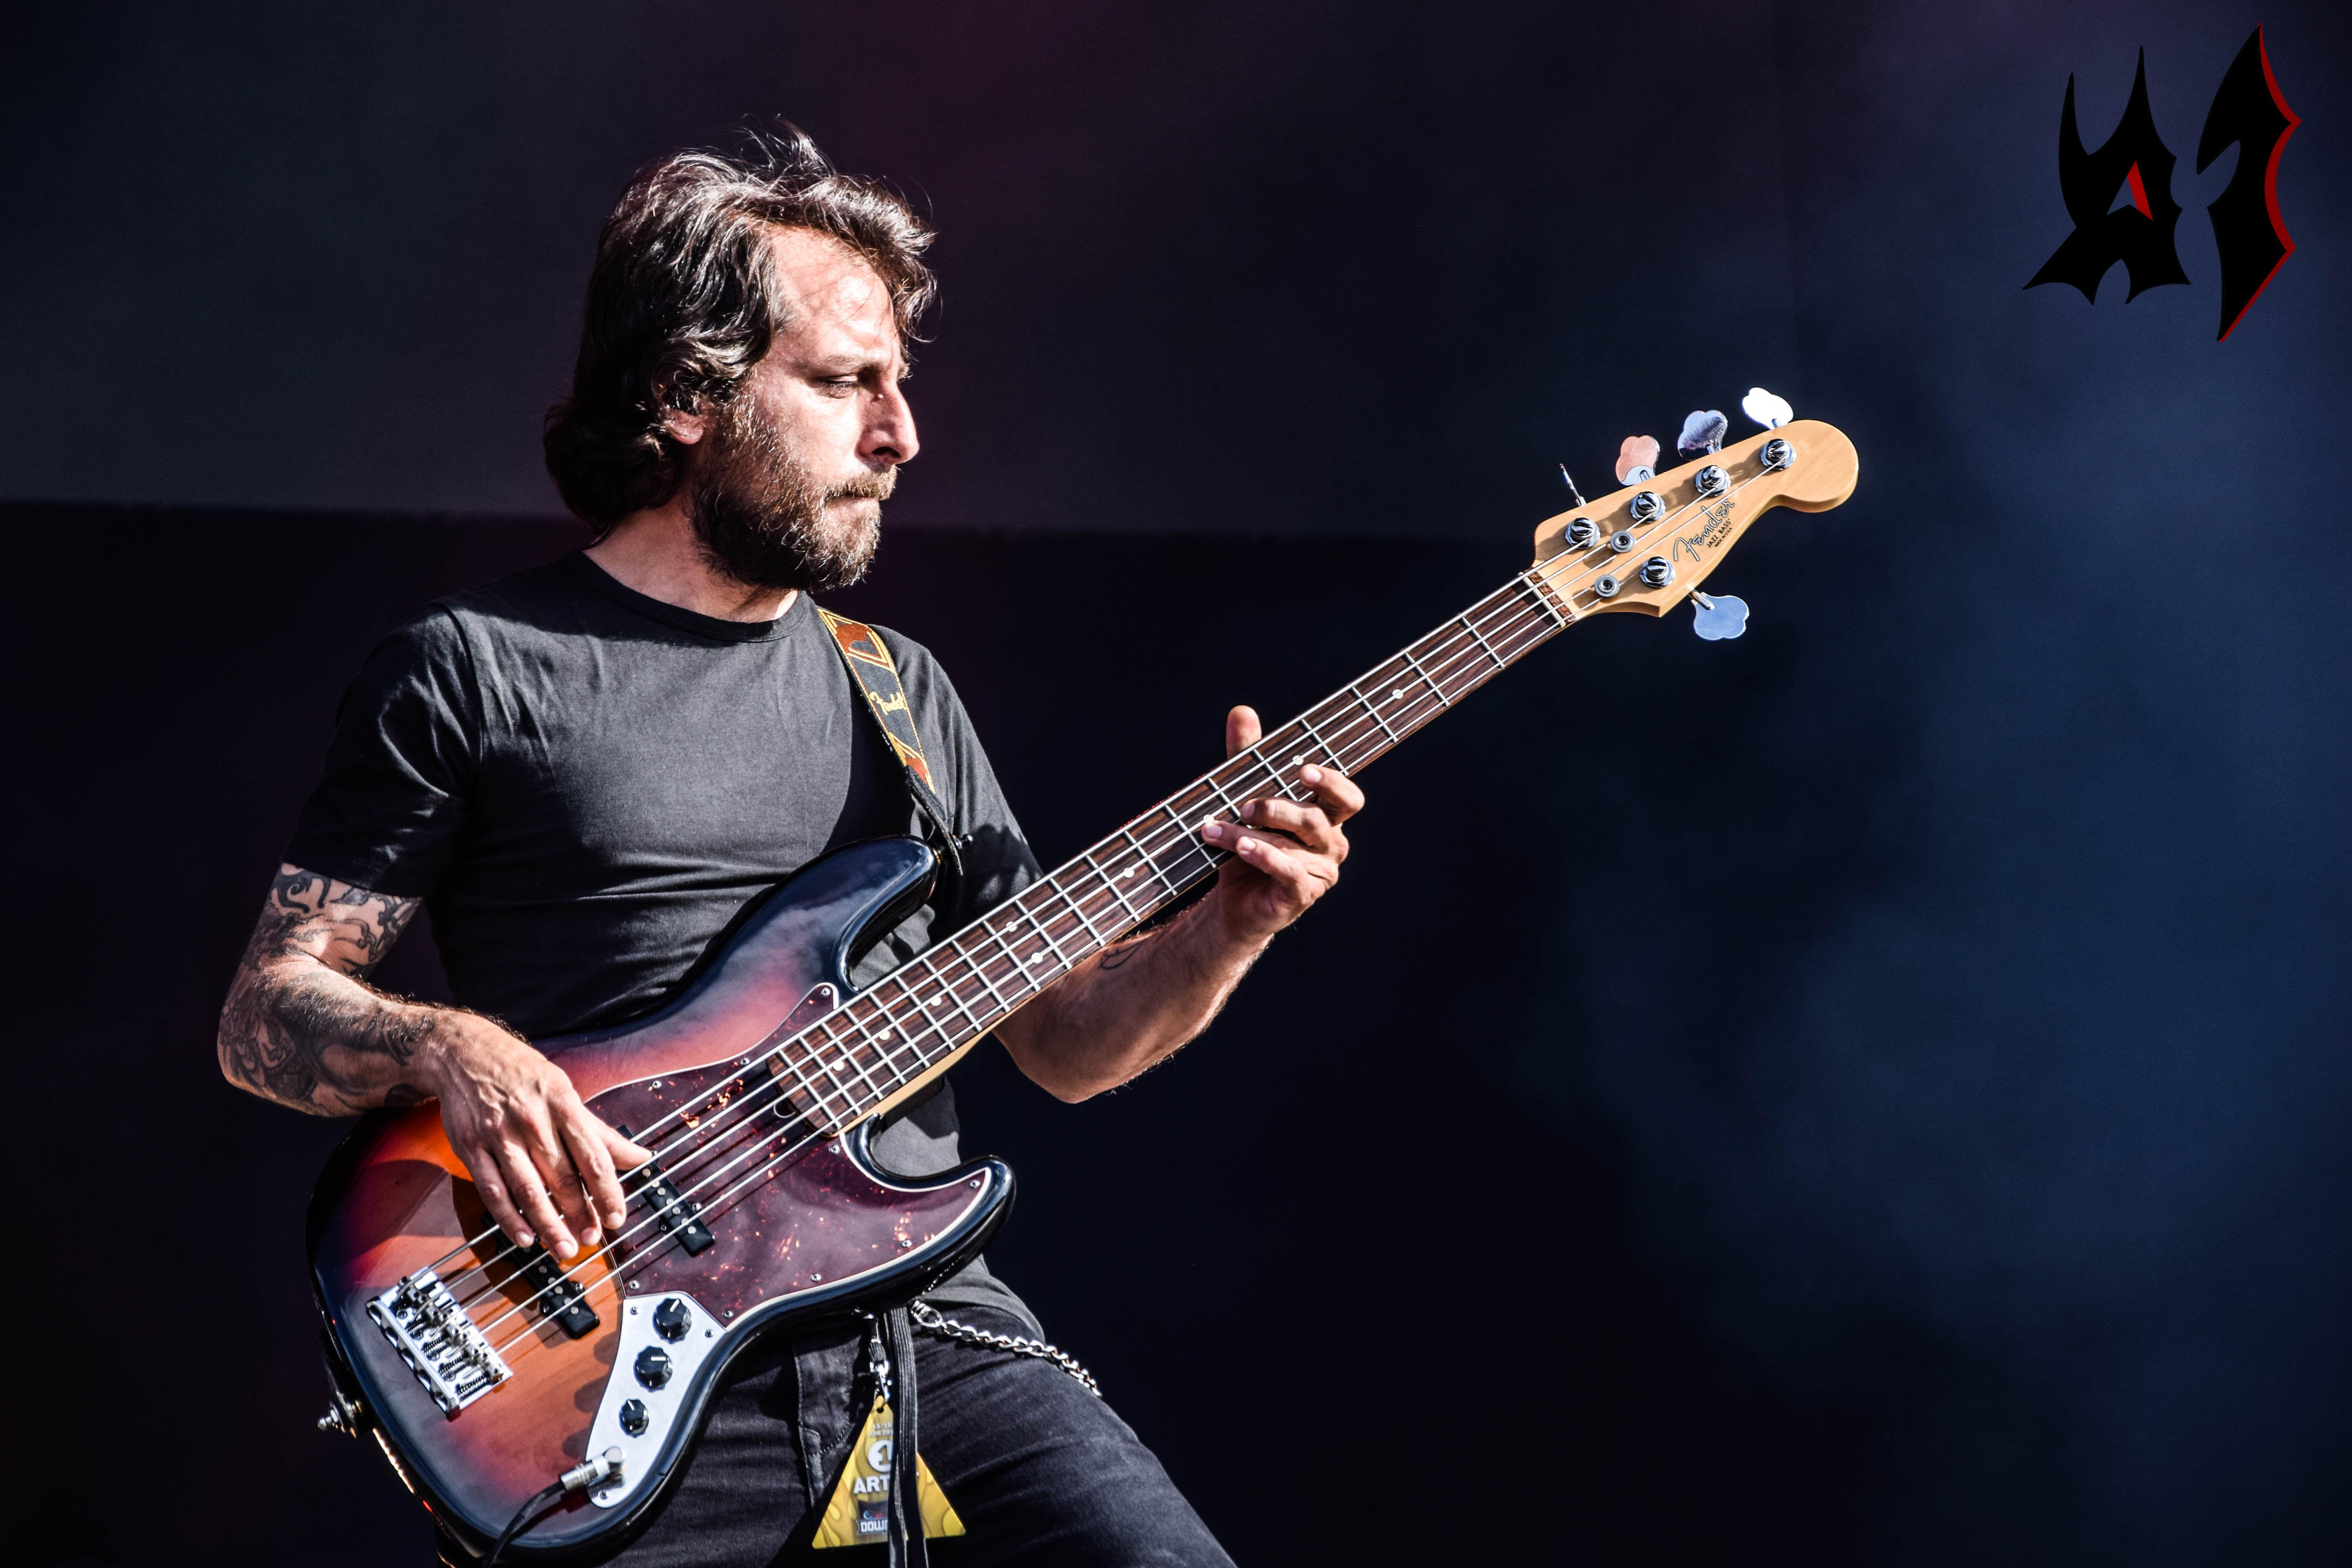 Donwload 2018 – Day 1 - Opeth 1